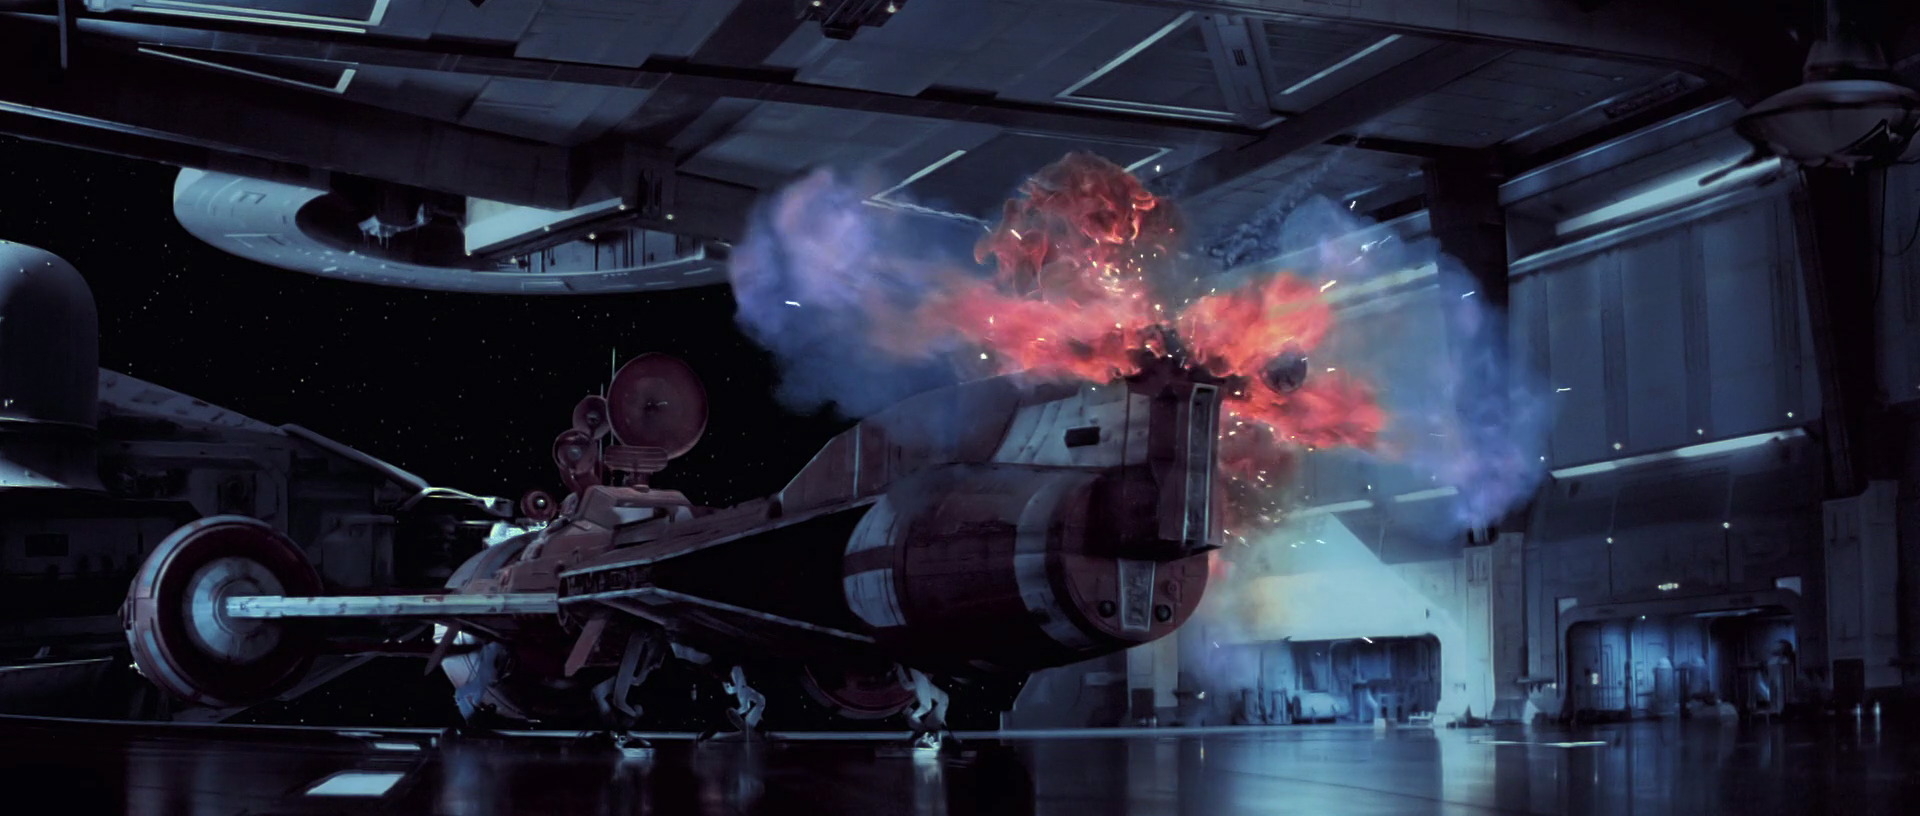 starwars1-movie-screencaps.com-410